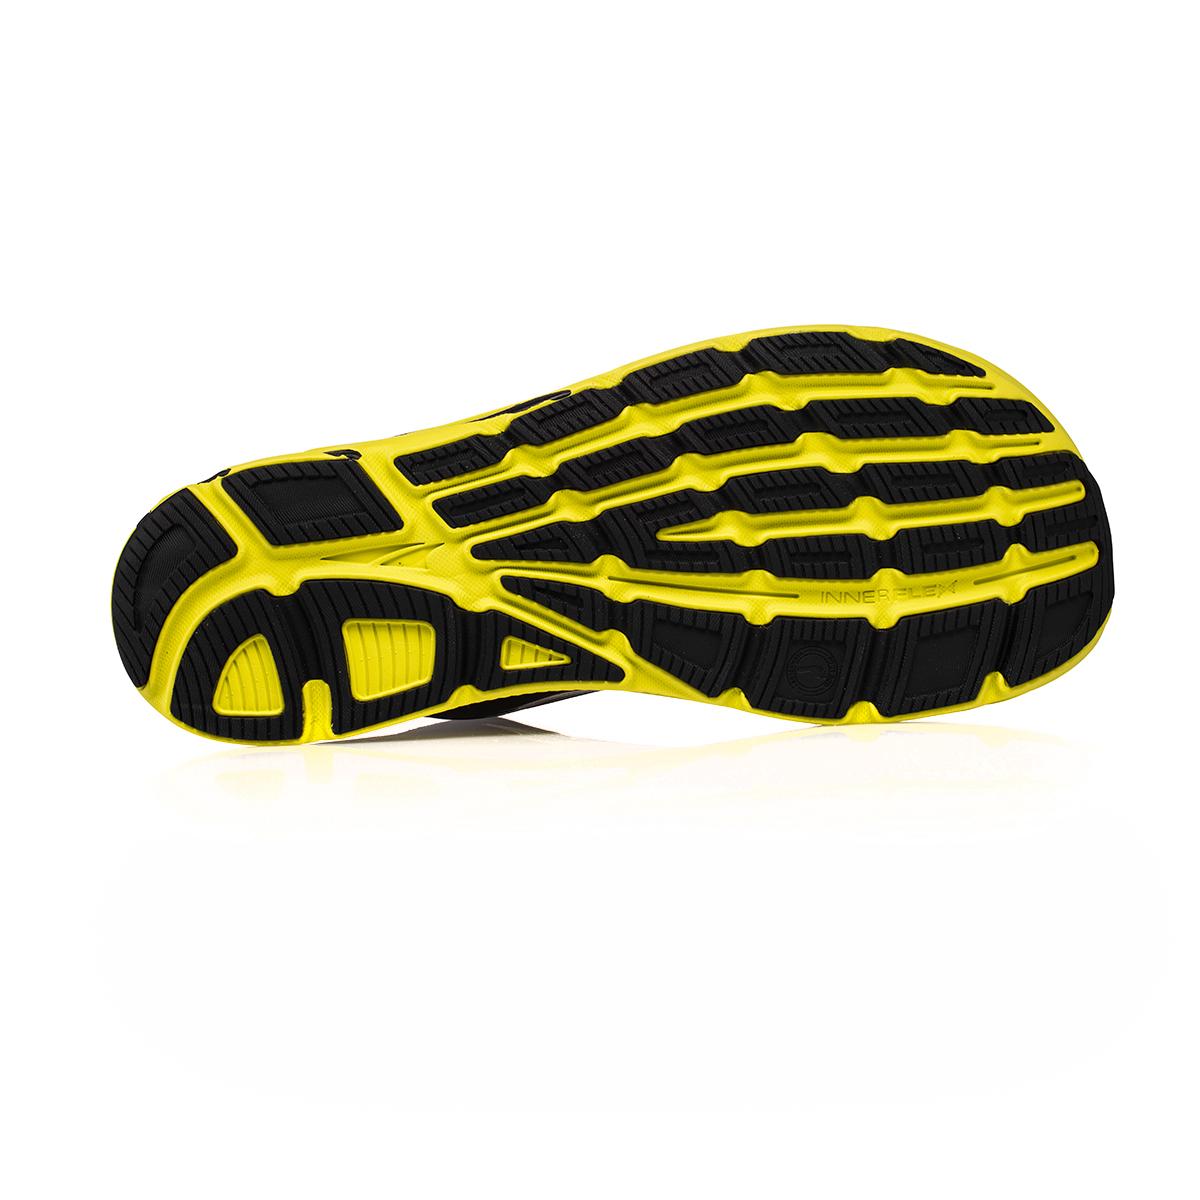 Men's Altra Torin 4 Running Shoe - Color: Gray/Lime - Size: 7 - Width: Regular, Gray/Lime, large, image 4